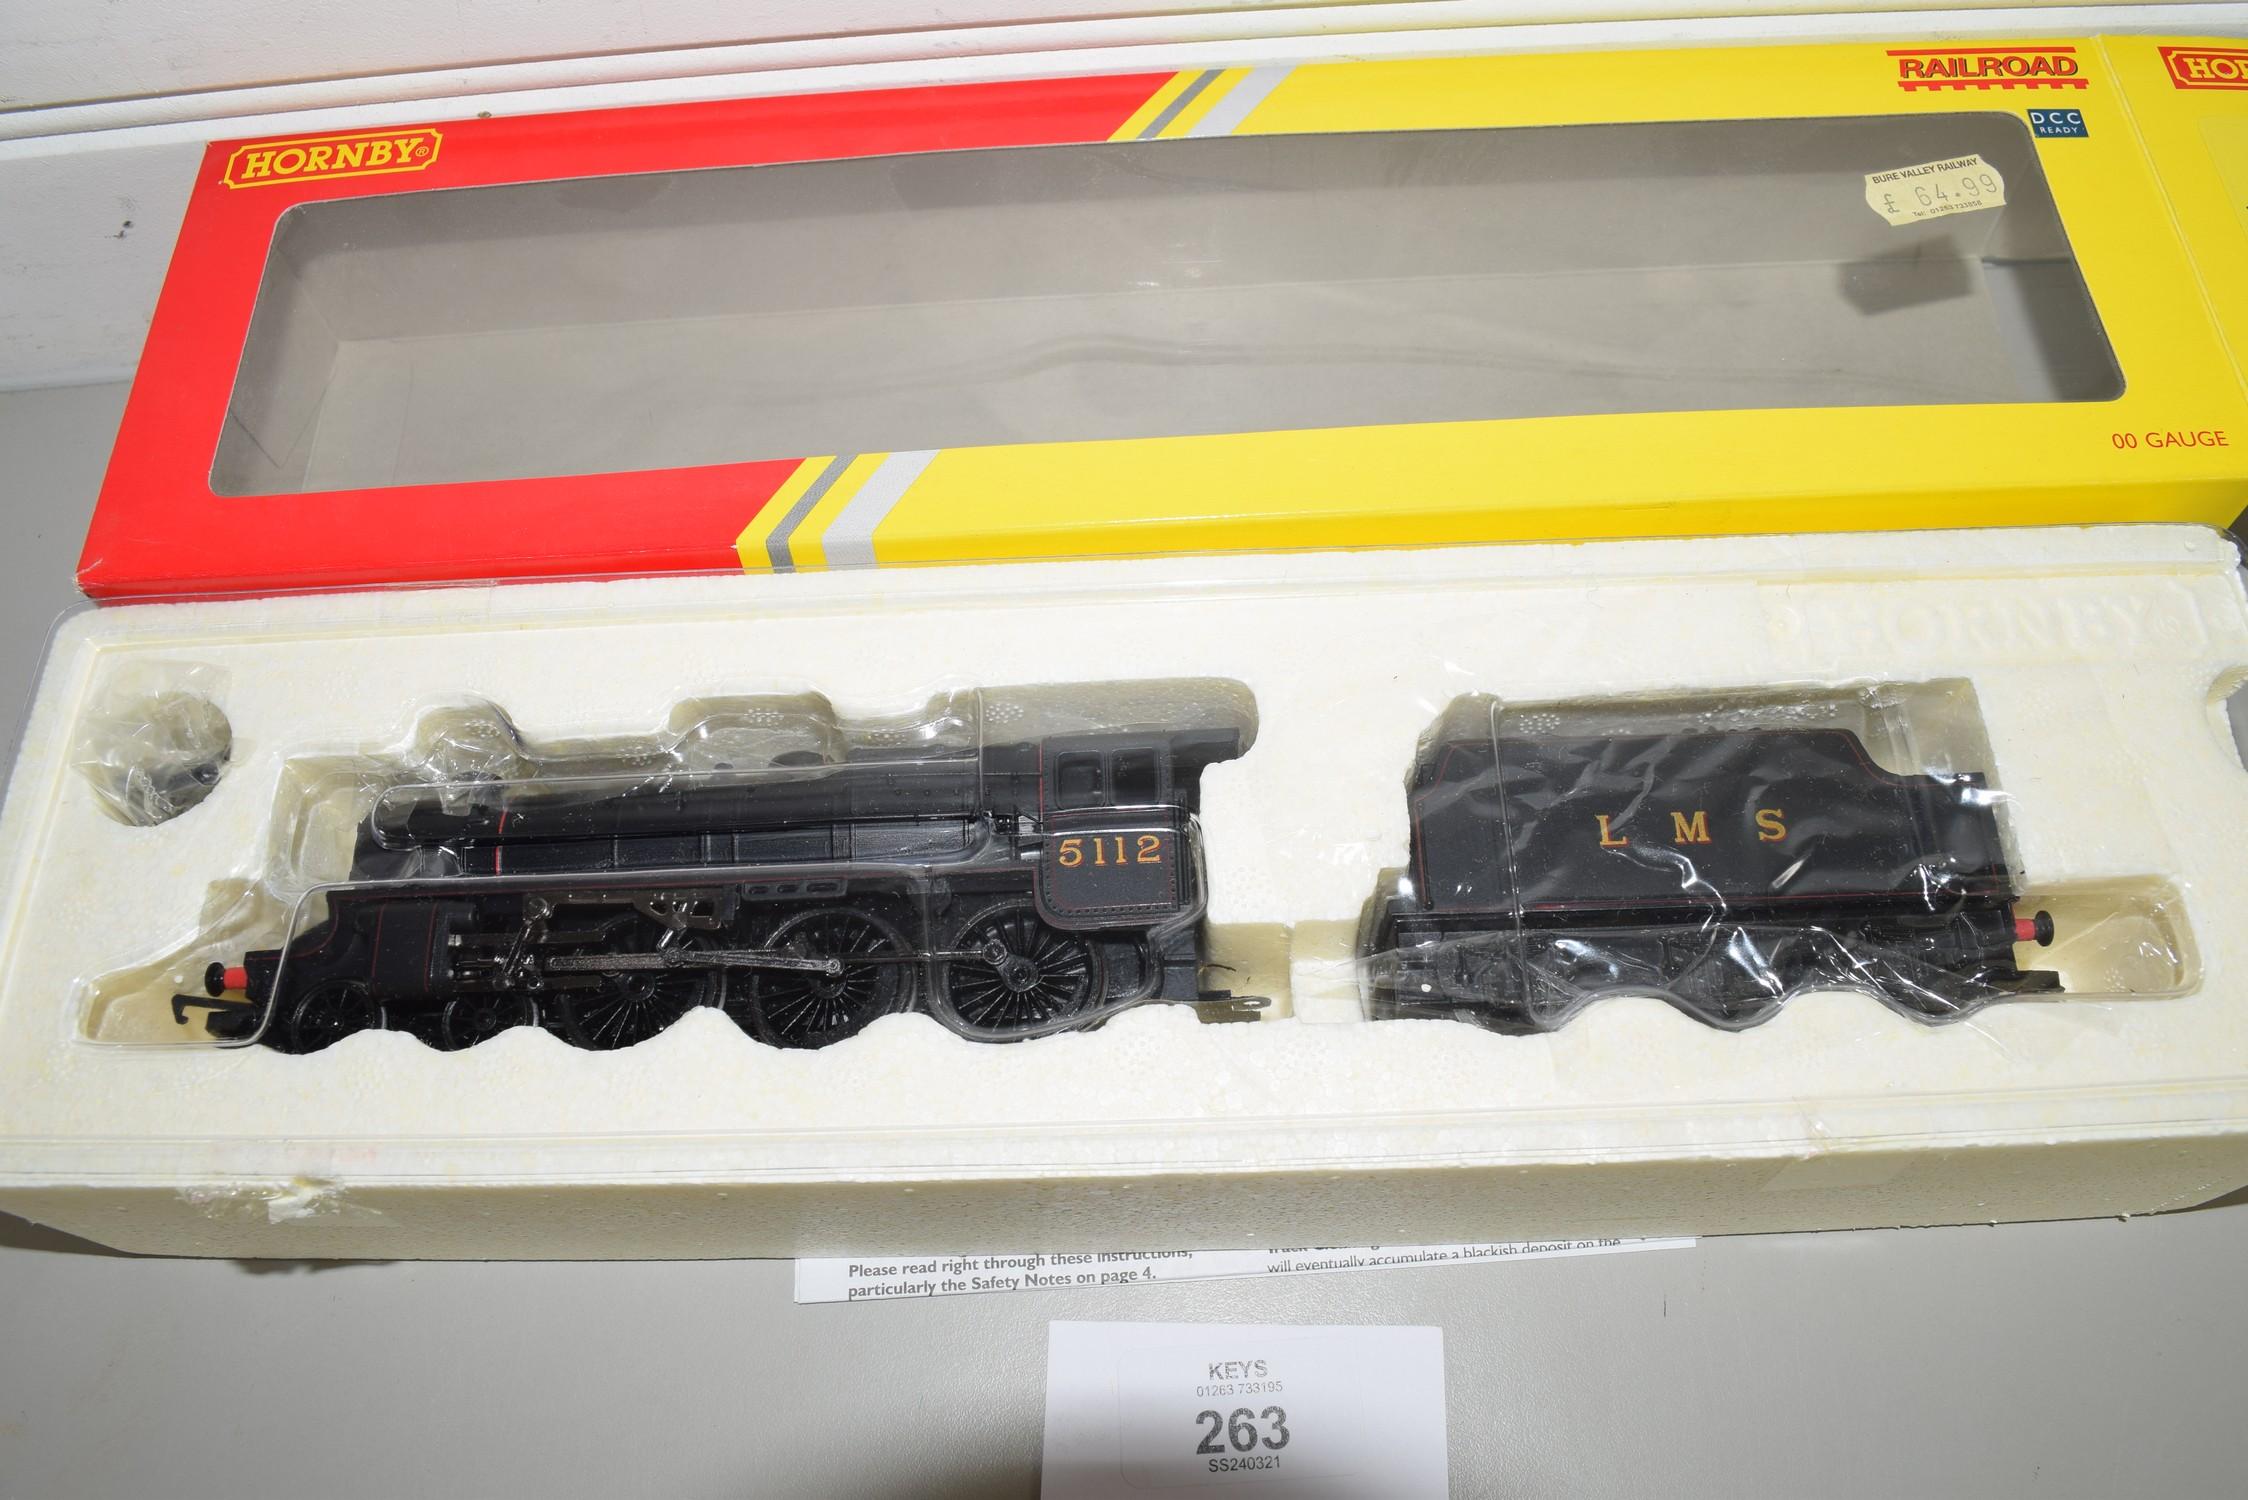 Boxed Hornby 00 gauge R2881 LMS class 5 locomotive No 5112